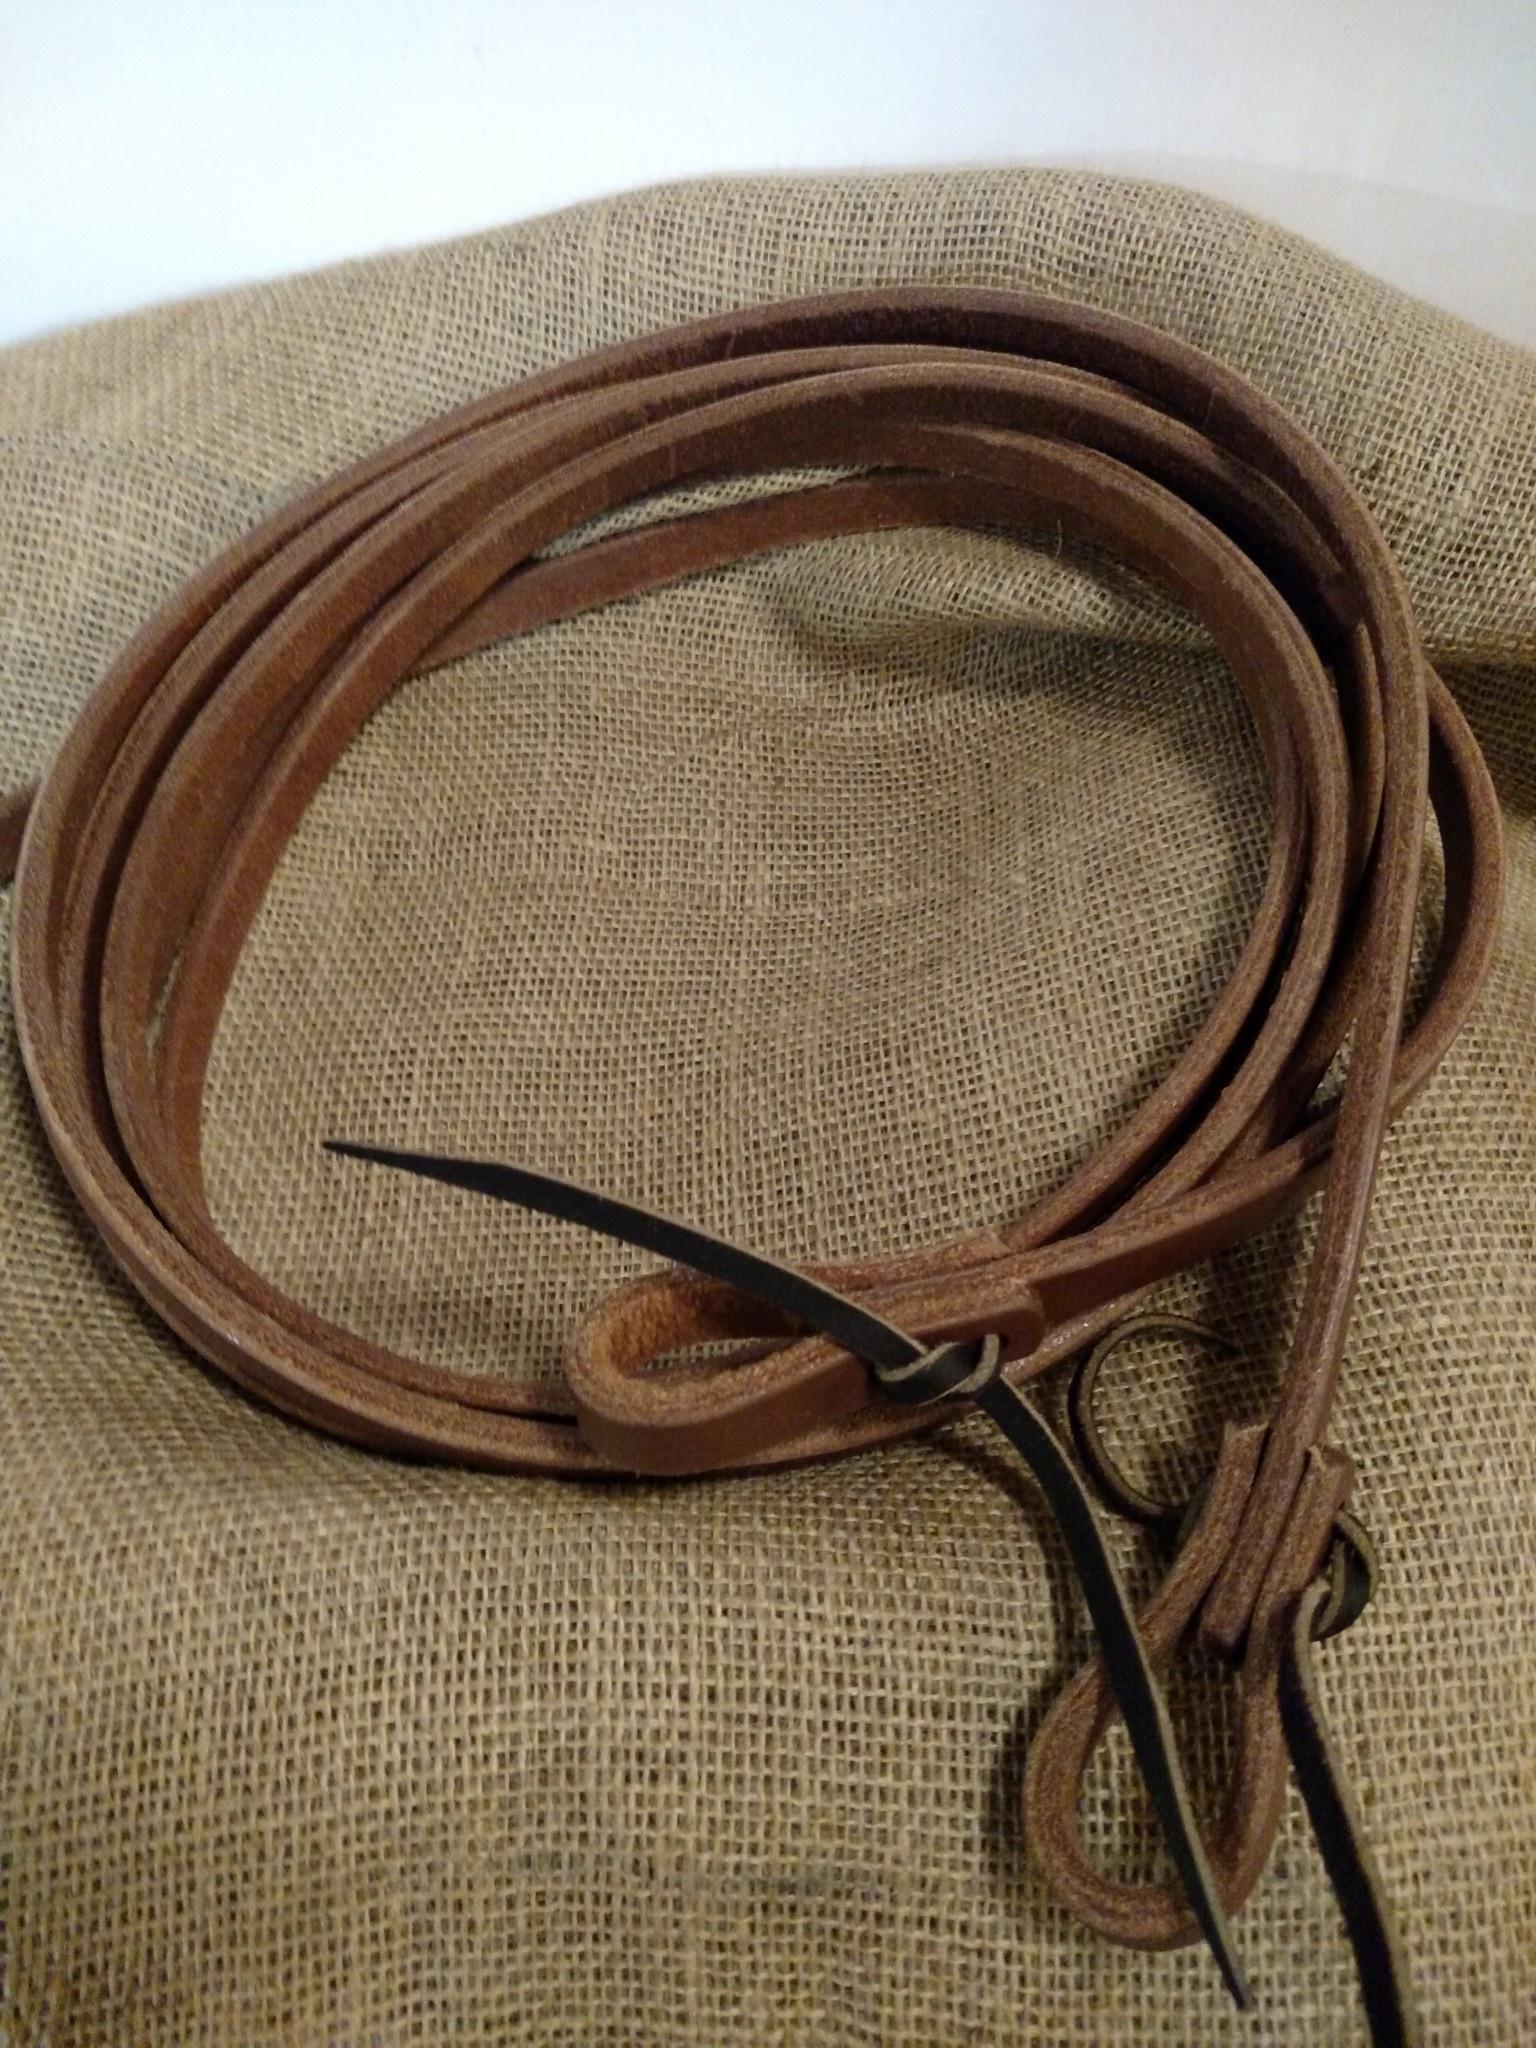 Circle L Circle L Leather Split Reins w/ Tie Ends, U.S.A. Made - 8' Long